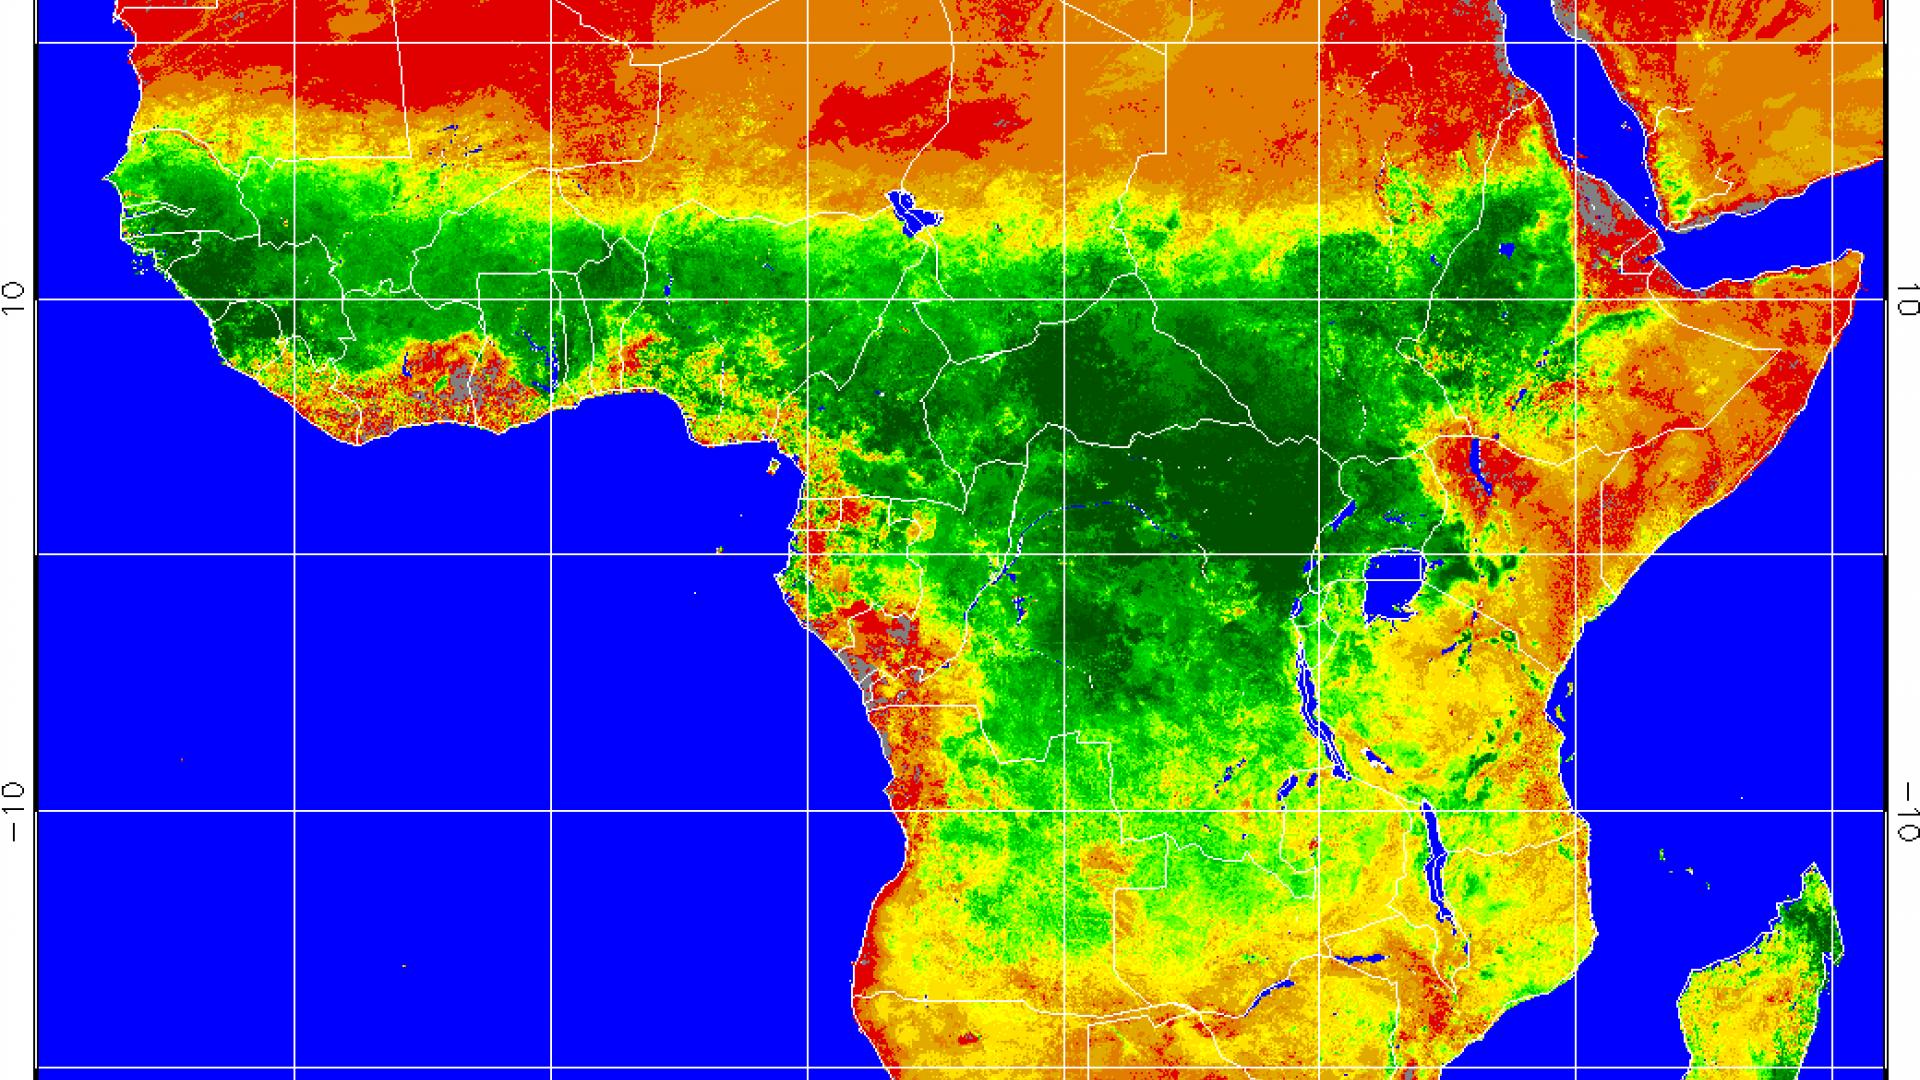 Prolonged drought in Kenya